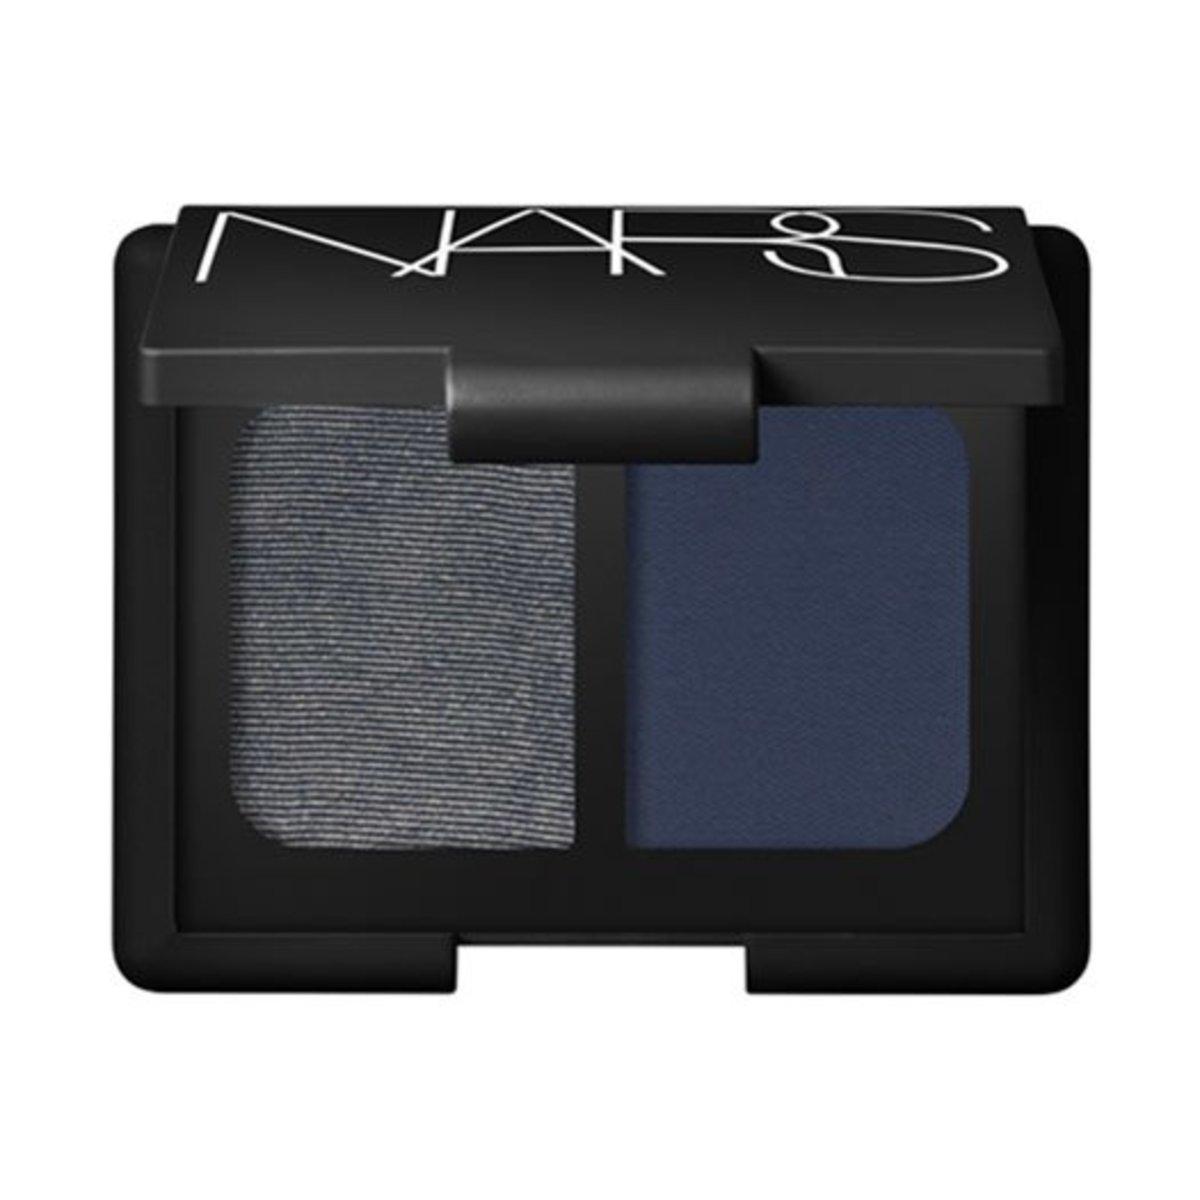 NARS-Eyeshadow-Duo-in-Mandchourie